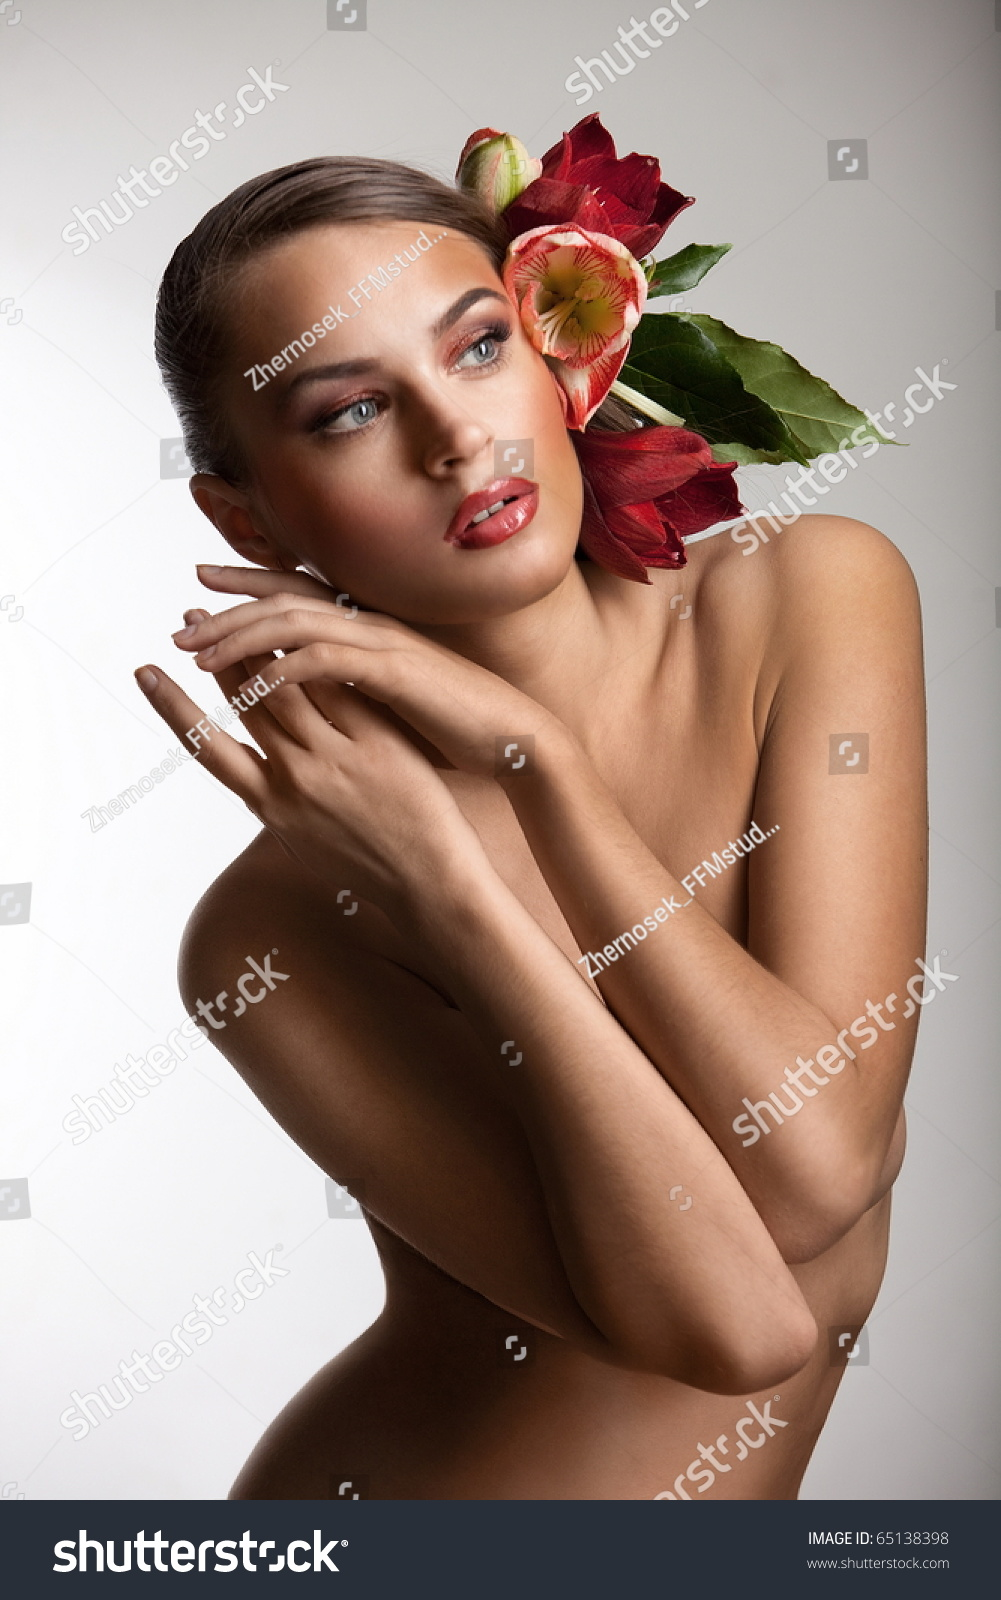 Short woman sex nude